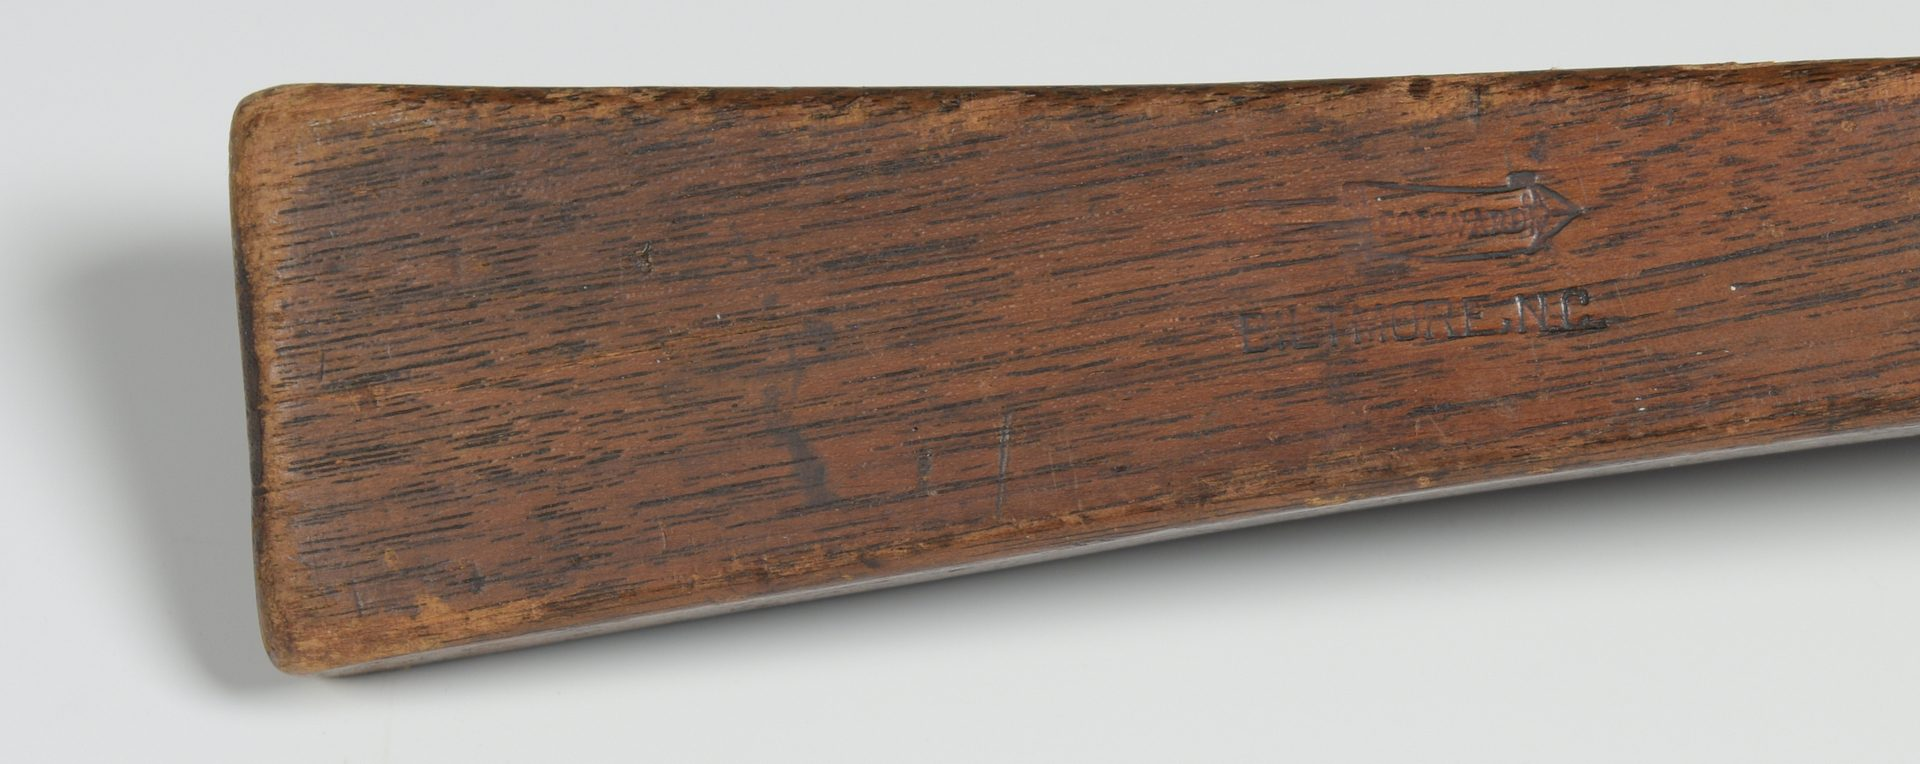 Lot 563: Biltmore Industries Golliwog Broom